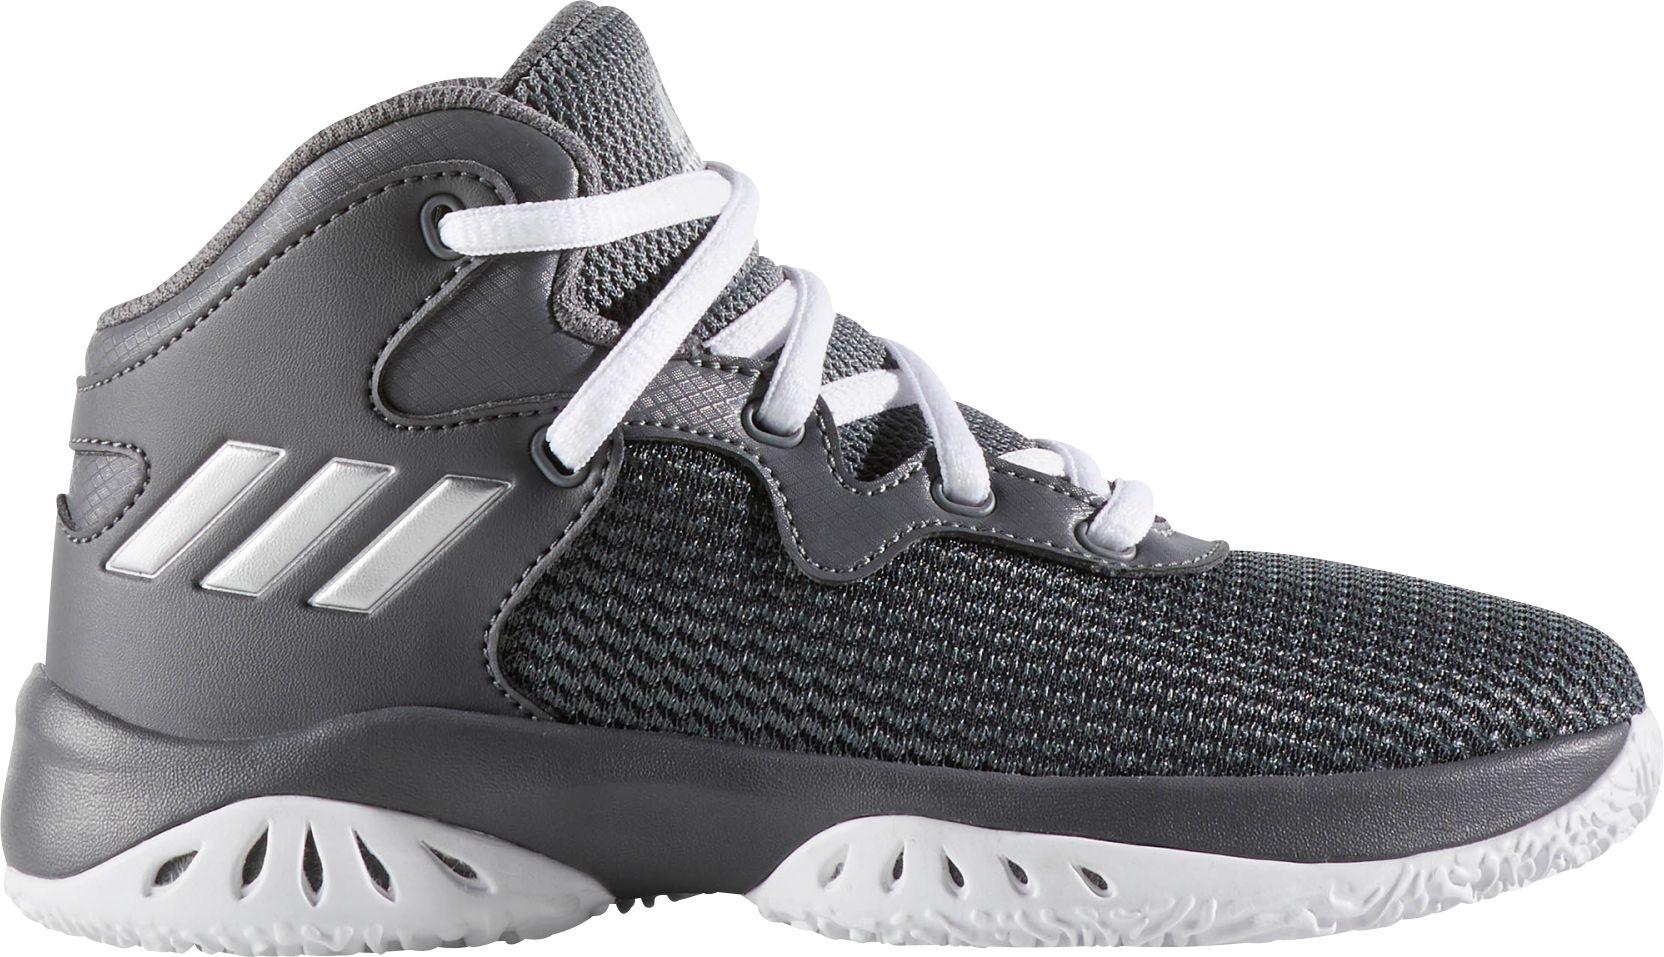 Adidas Rask Sprette Basketball Sko X99eXxefd